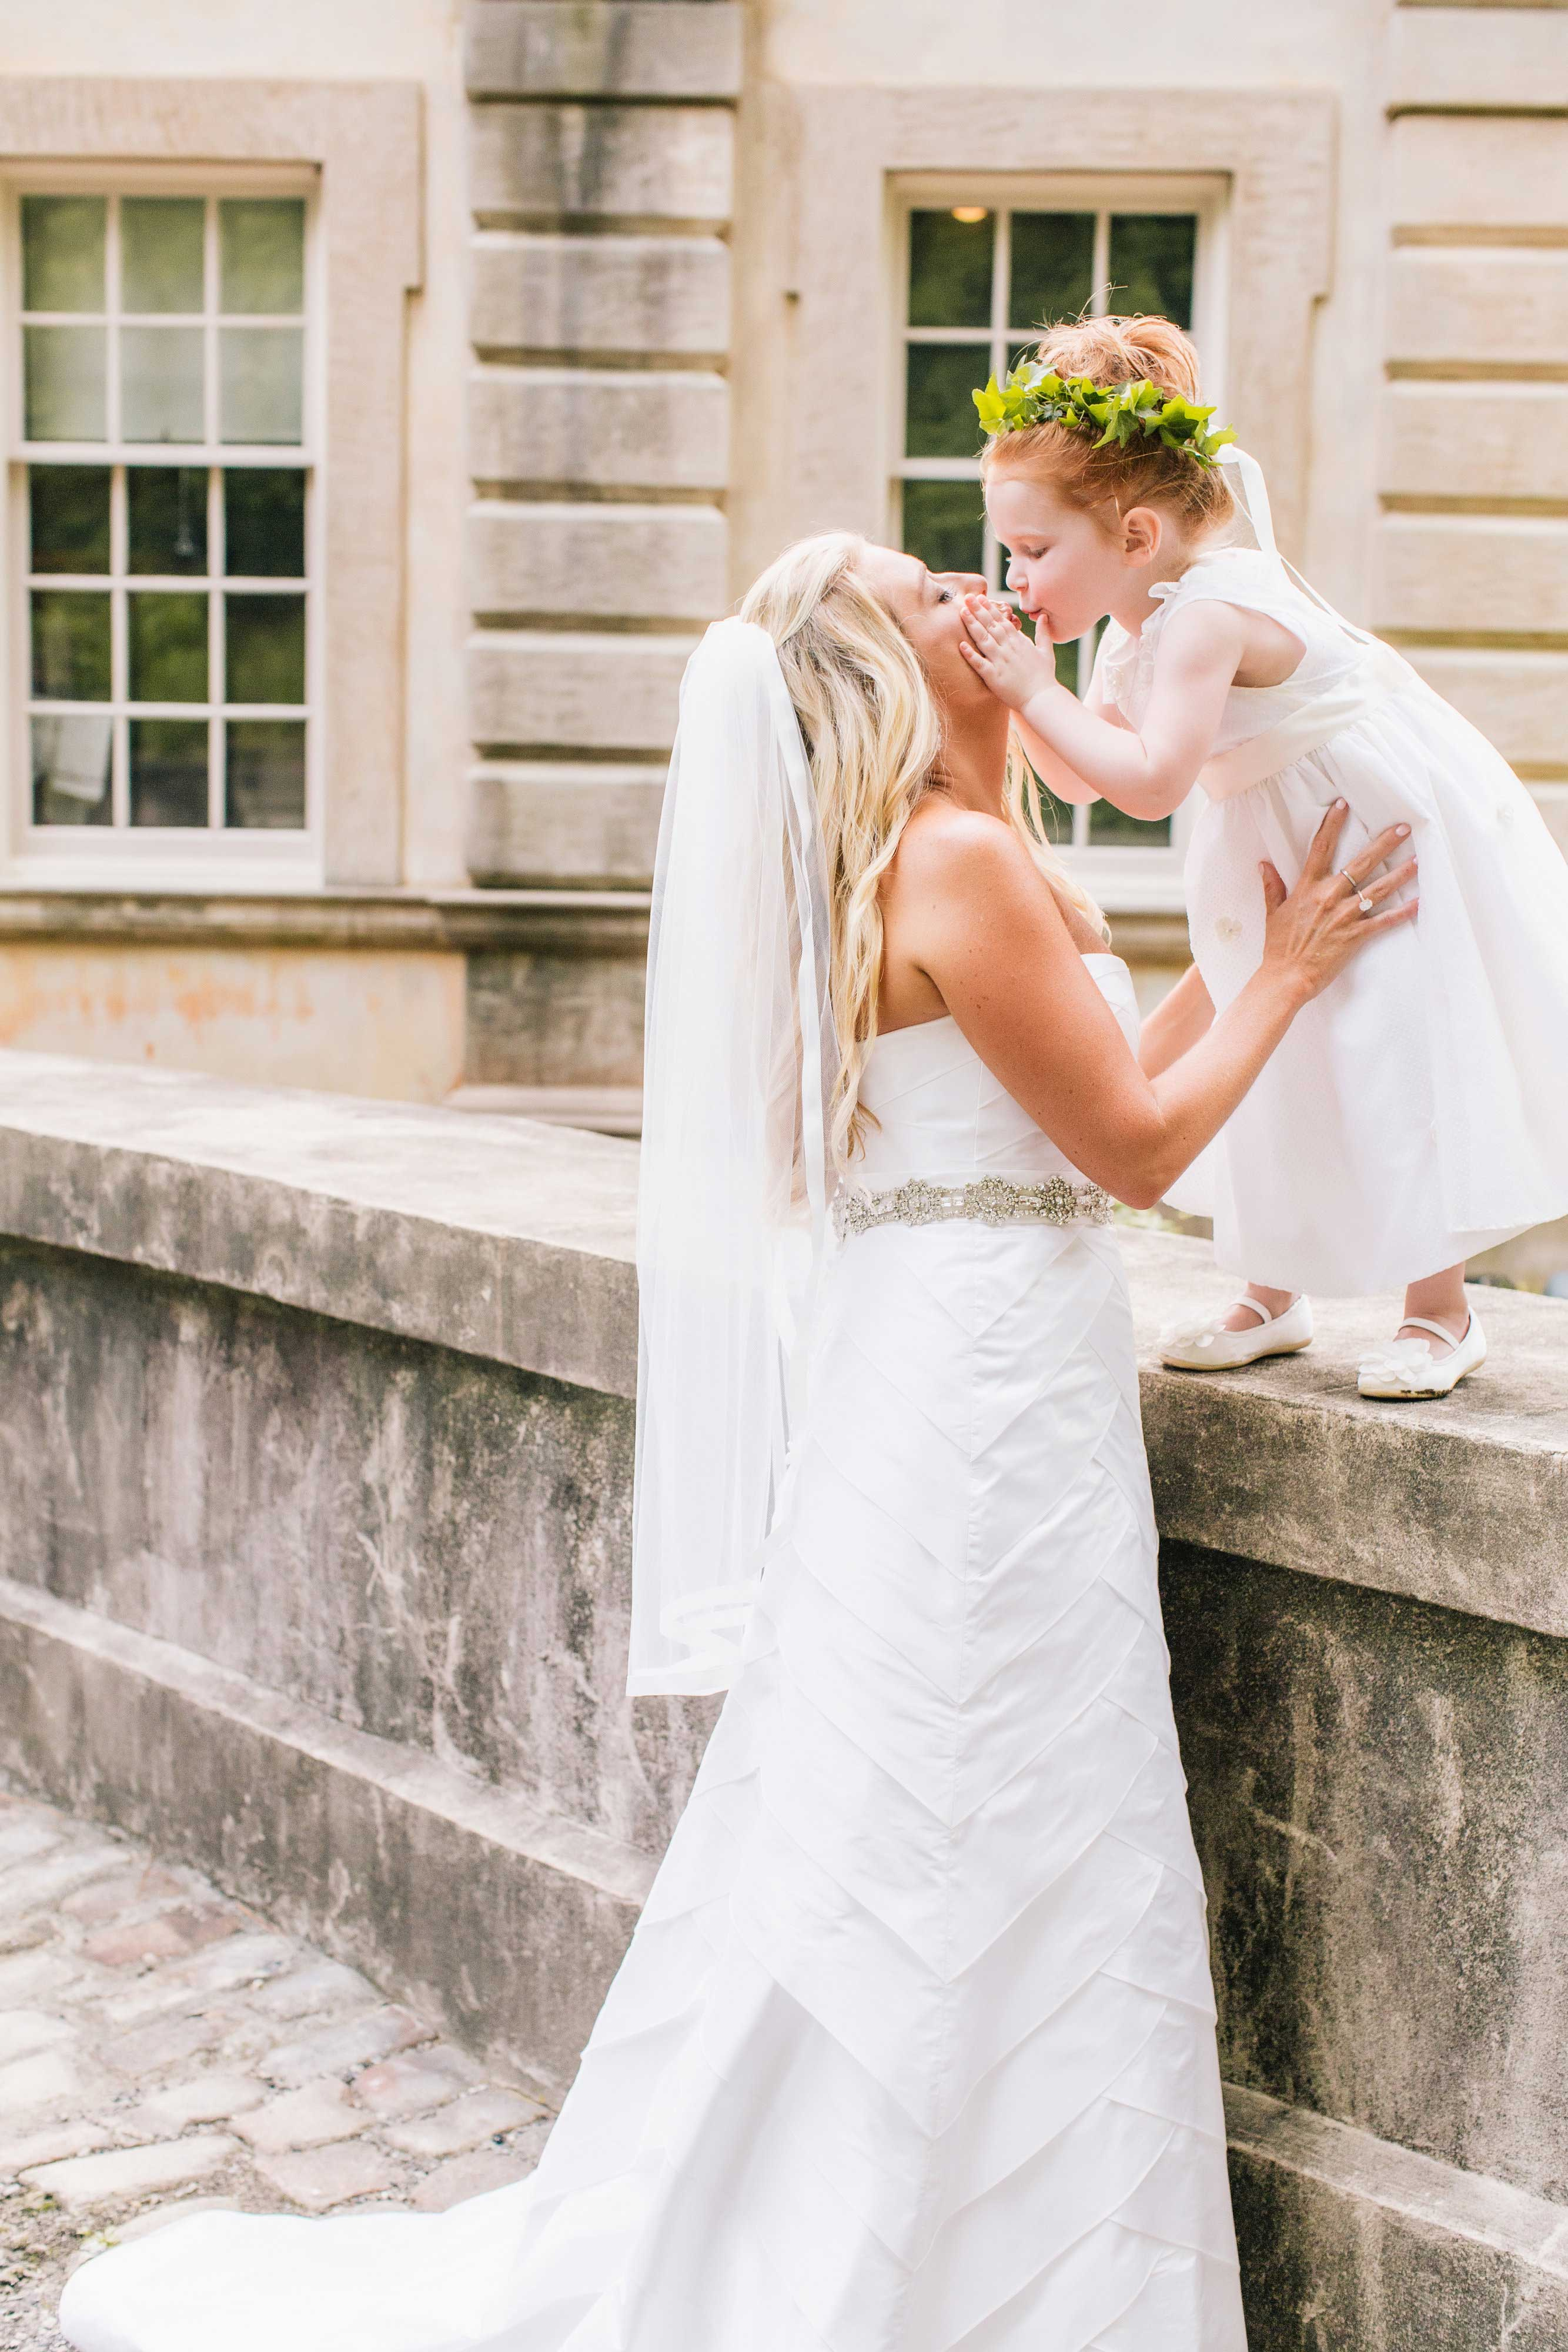 Red head flower girl kissing bride on lips wedding day